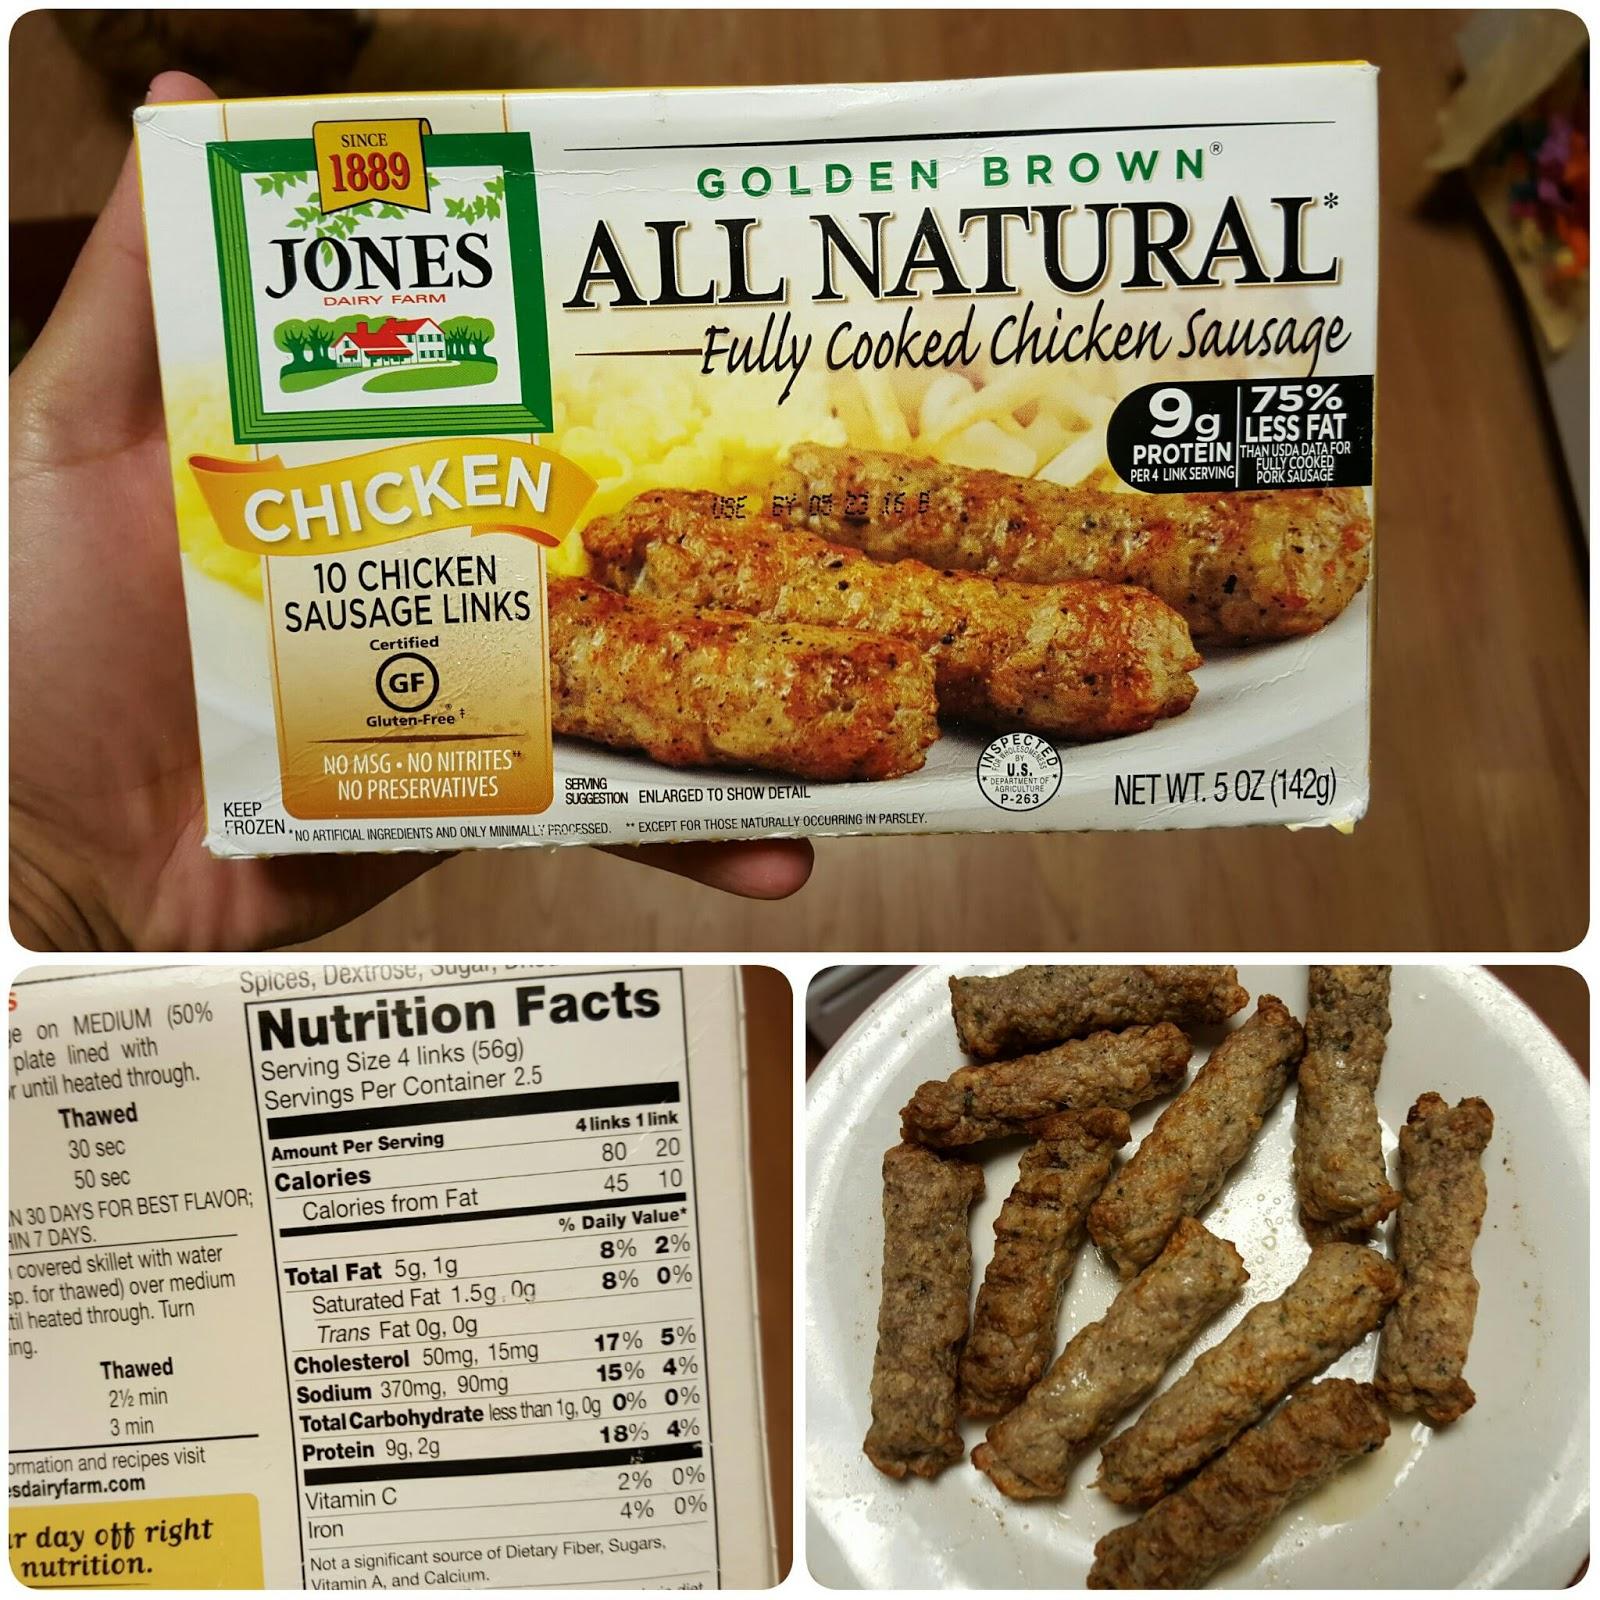 Jones Golden Brown All Natural